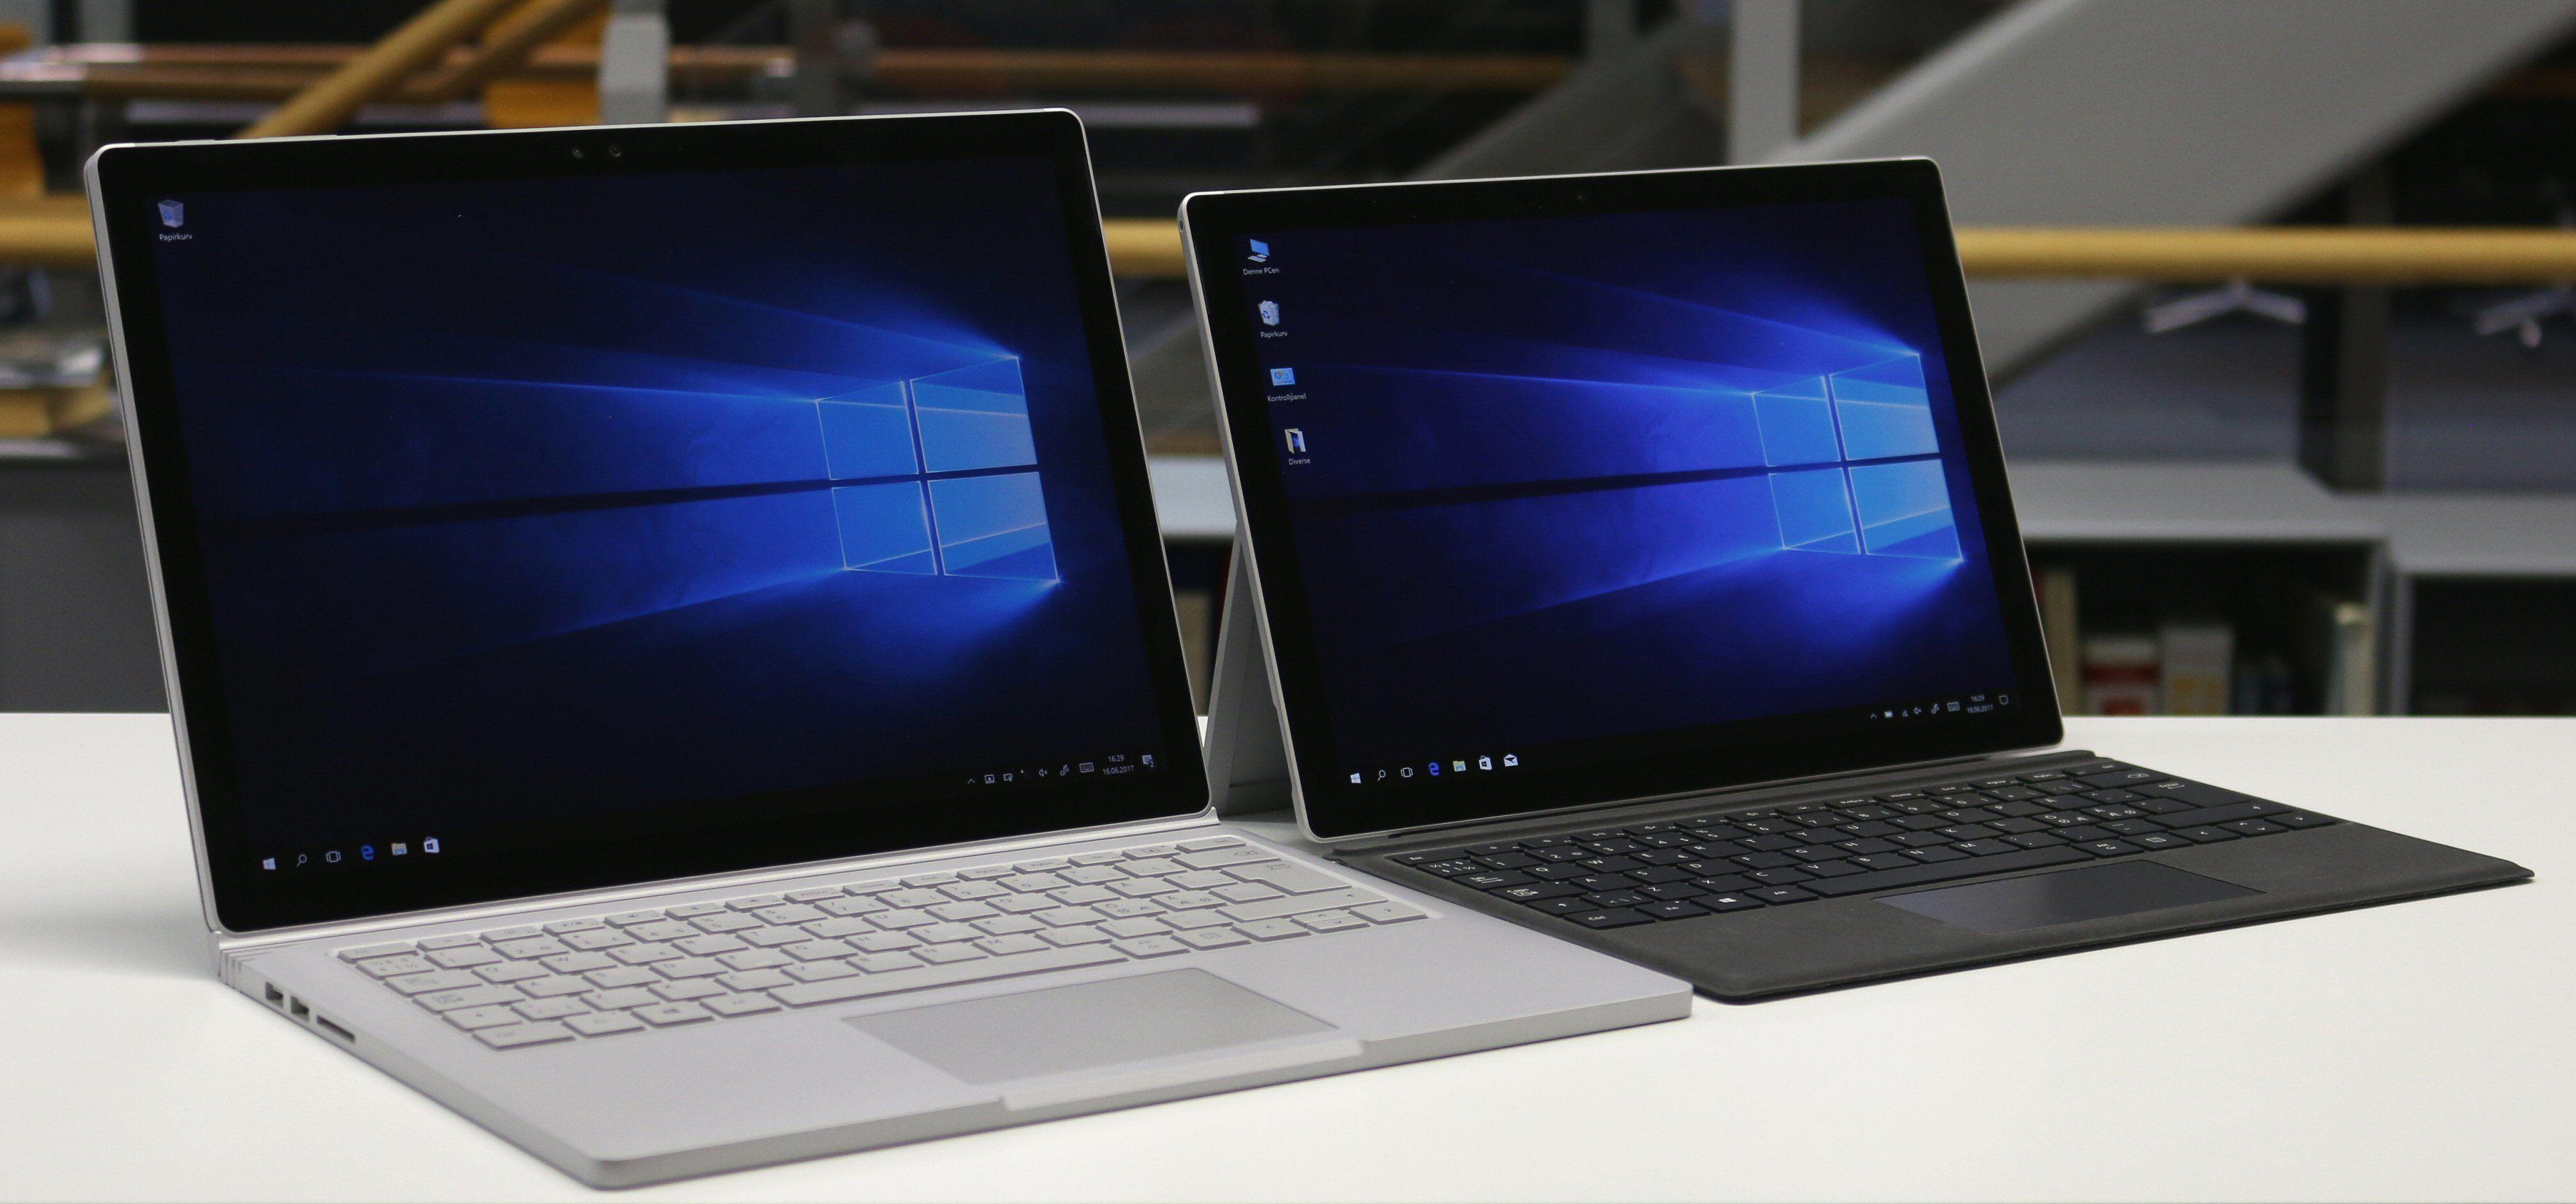 Surface Book (til venstre) er større, kraftigere og tyngre enn Surface Pro.